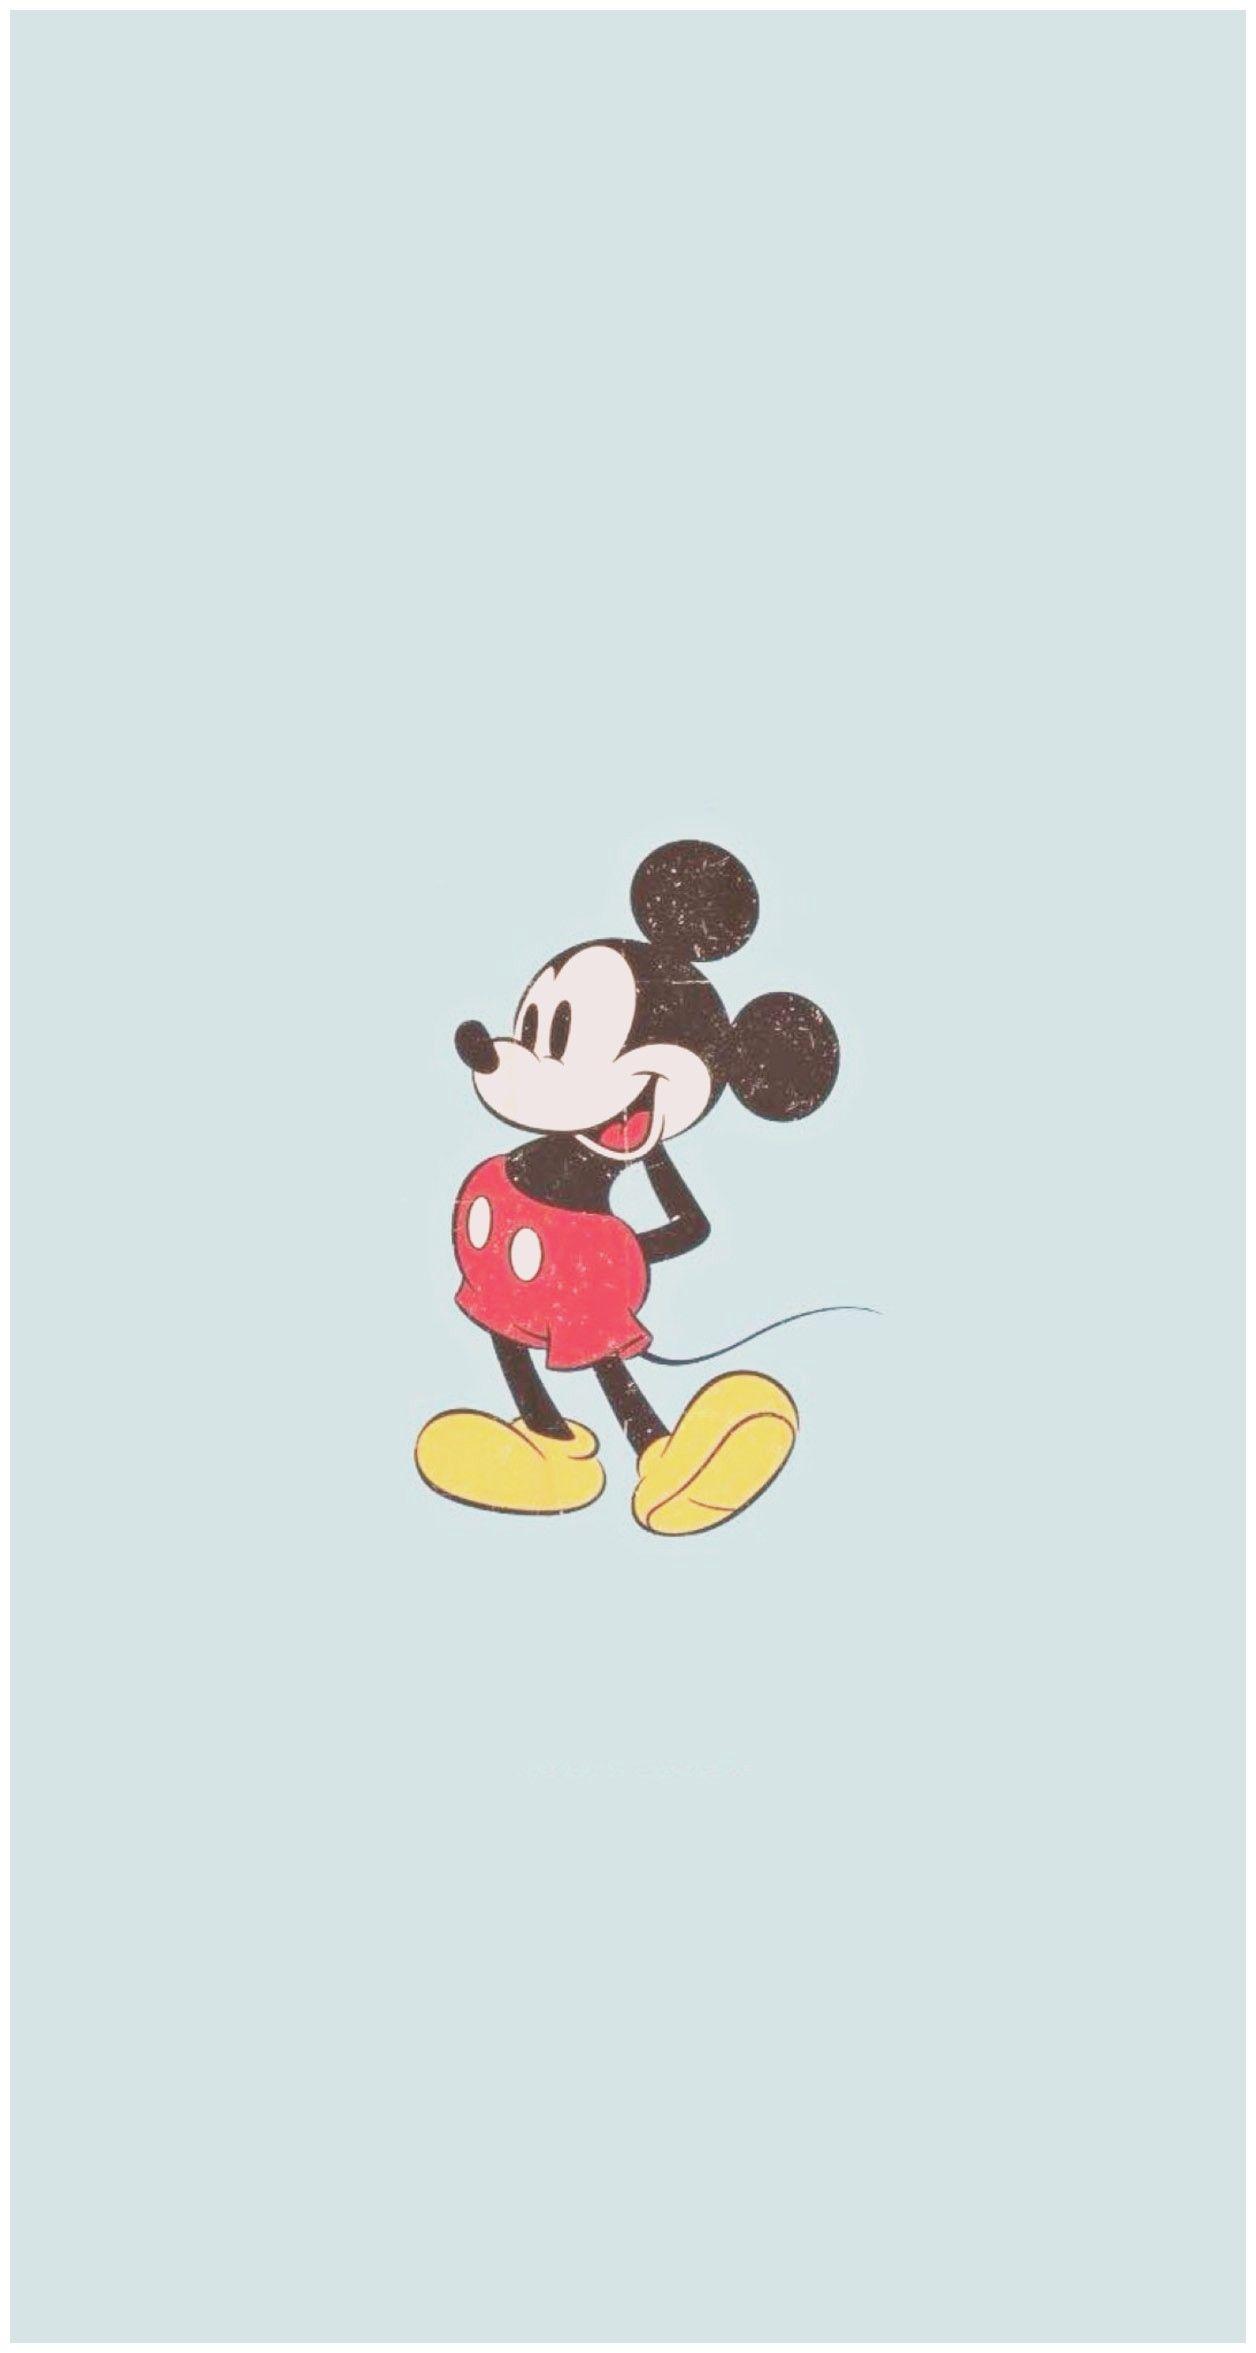 Mickey Mouse Iphone Wallpaper Pinterest Iphone Wallpaper Pinterest Mickey Mouse Wallpaper Iphone Disney Wallpaper